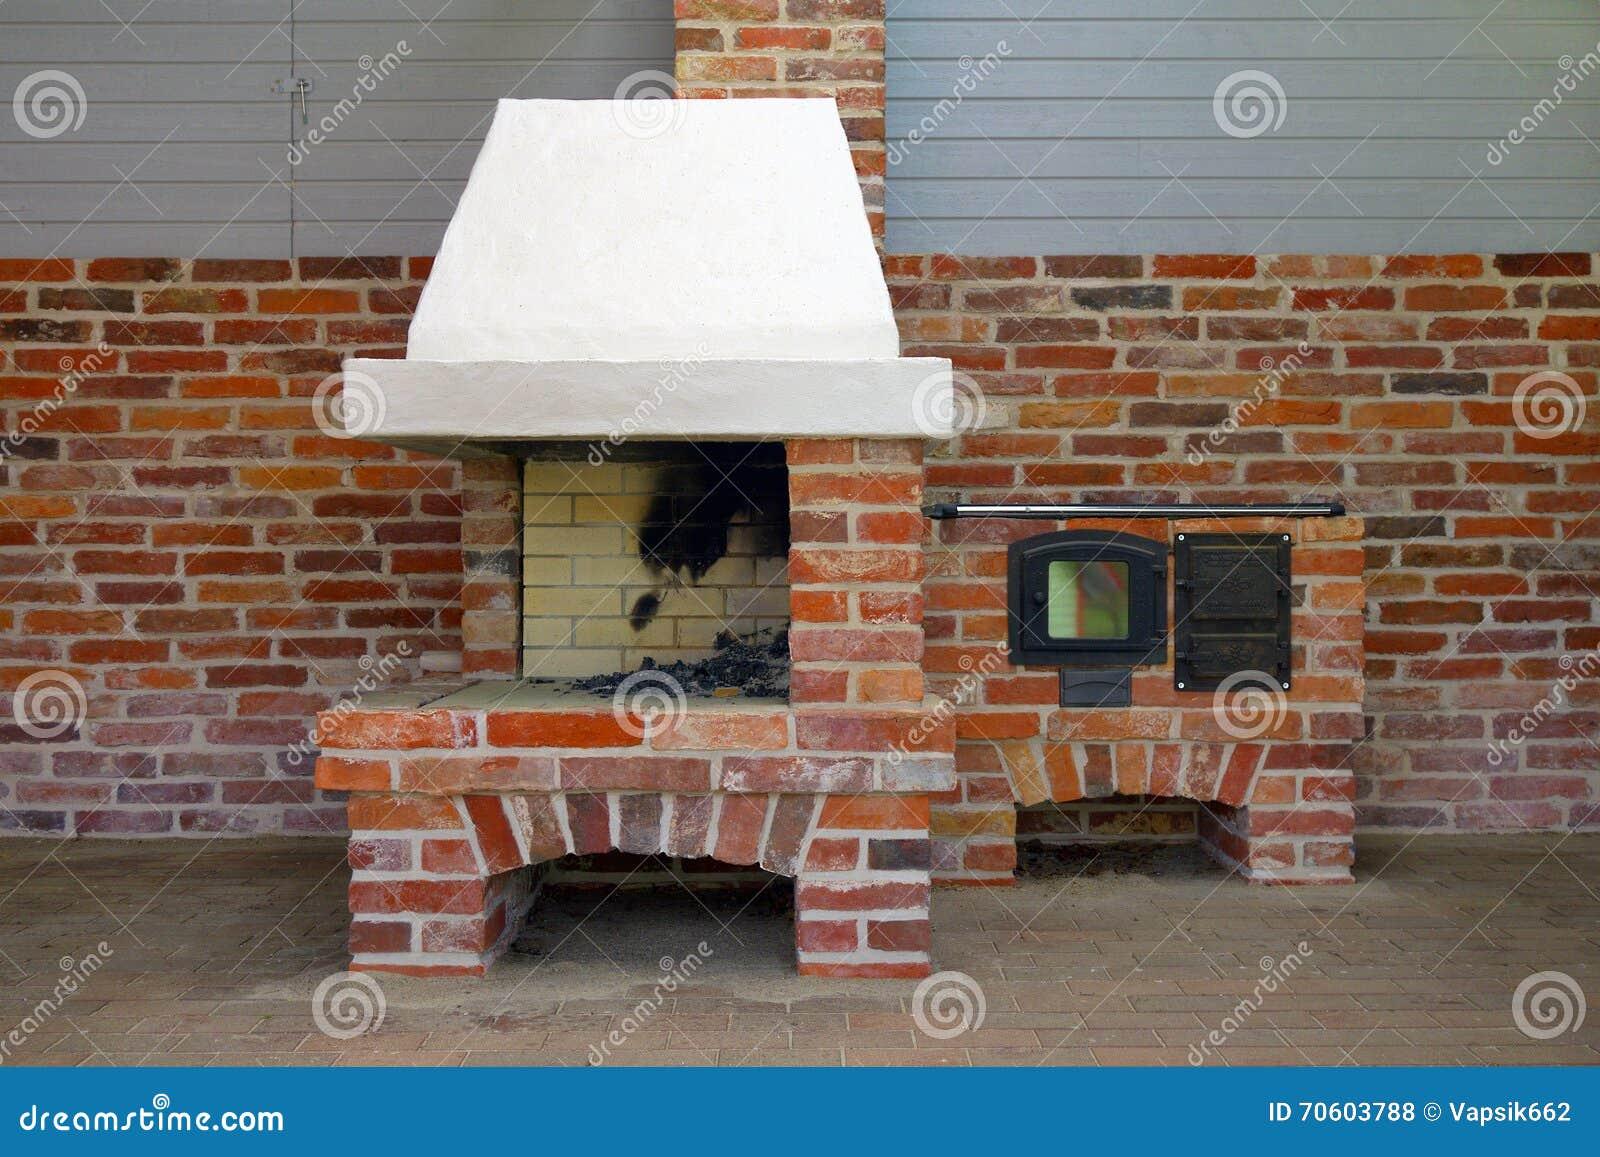 Sommerküche Kochen : Sommerküche stockfoto. bild von architektur ofen kochen 70603788